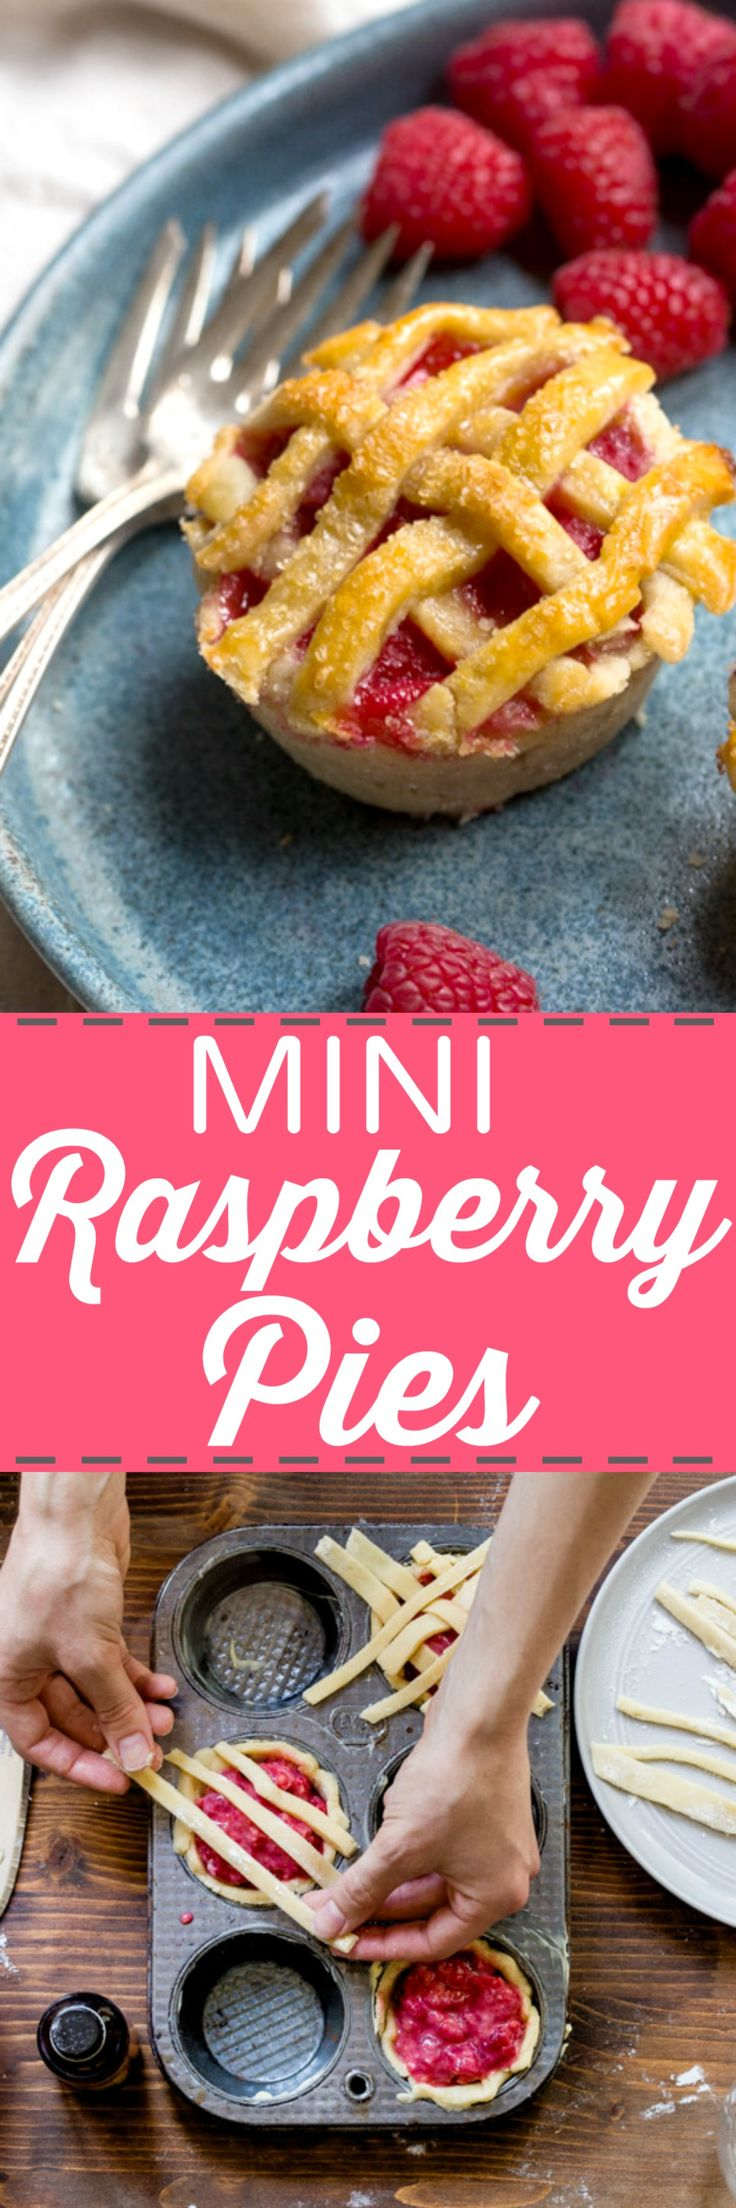 Muffin Tin Recipes That Make the Cutest Desserts